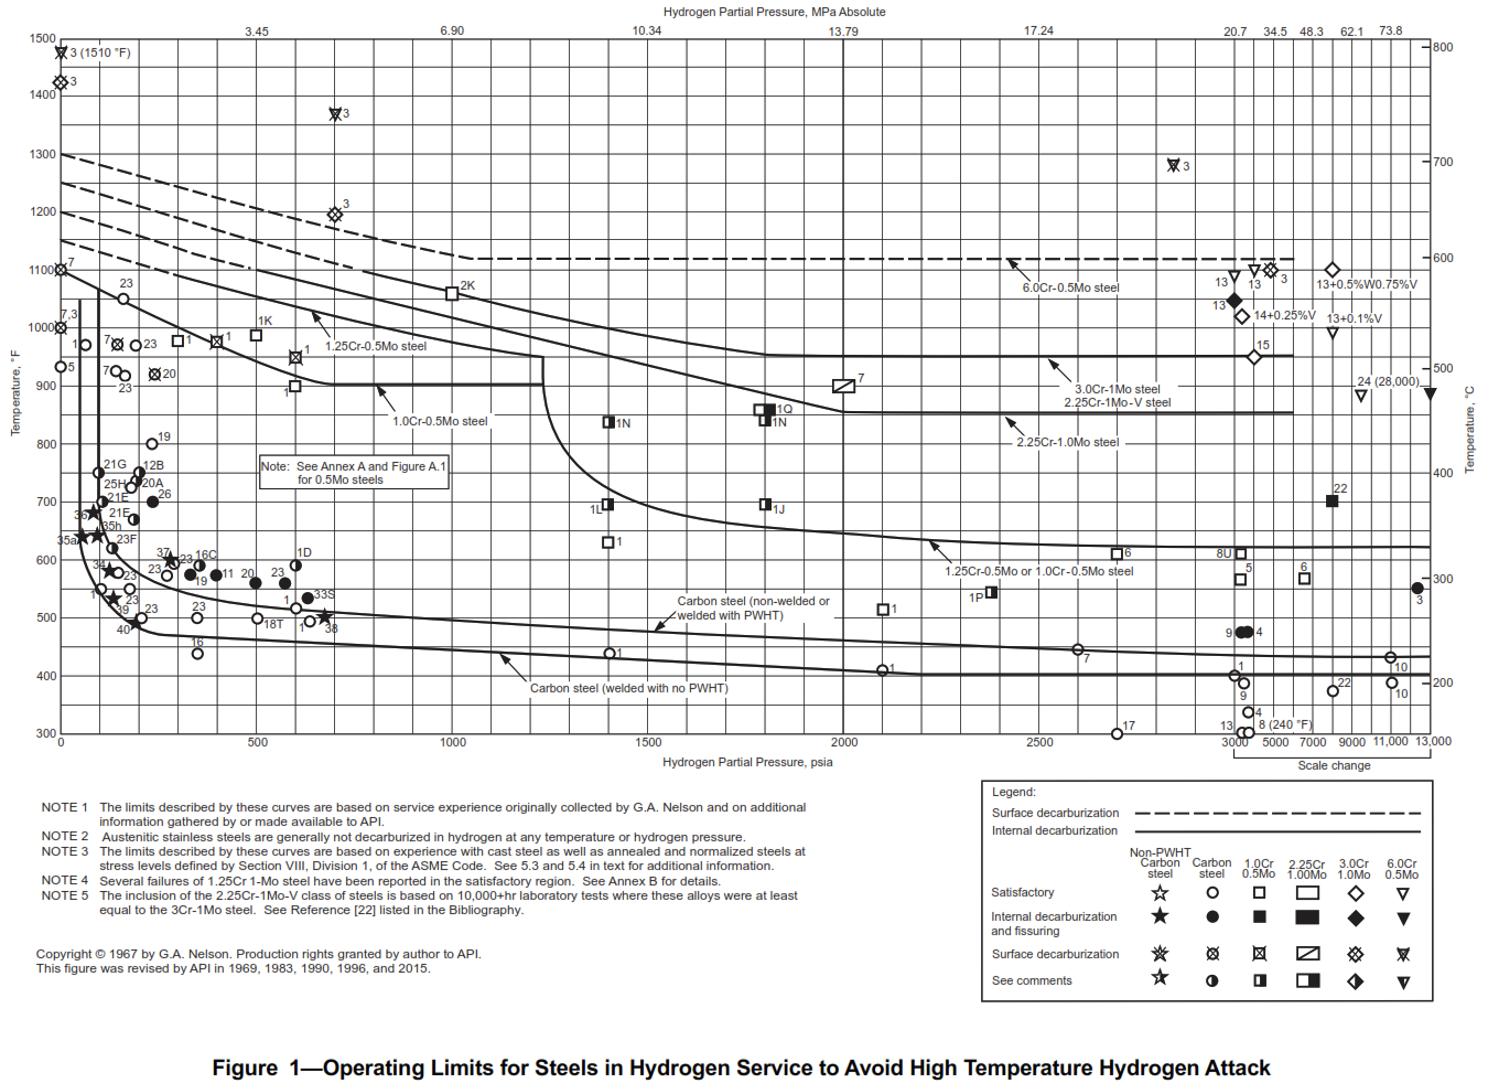 Figure 1. Nelson Curve. Source: API 941, Eighth Edition